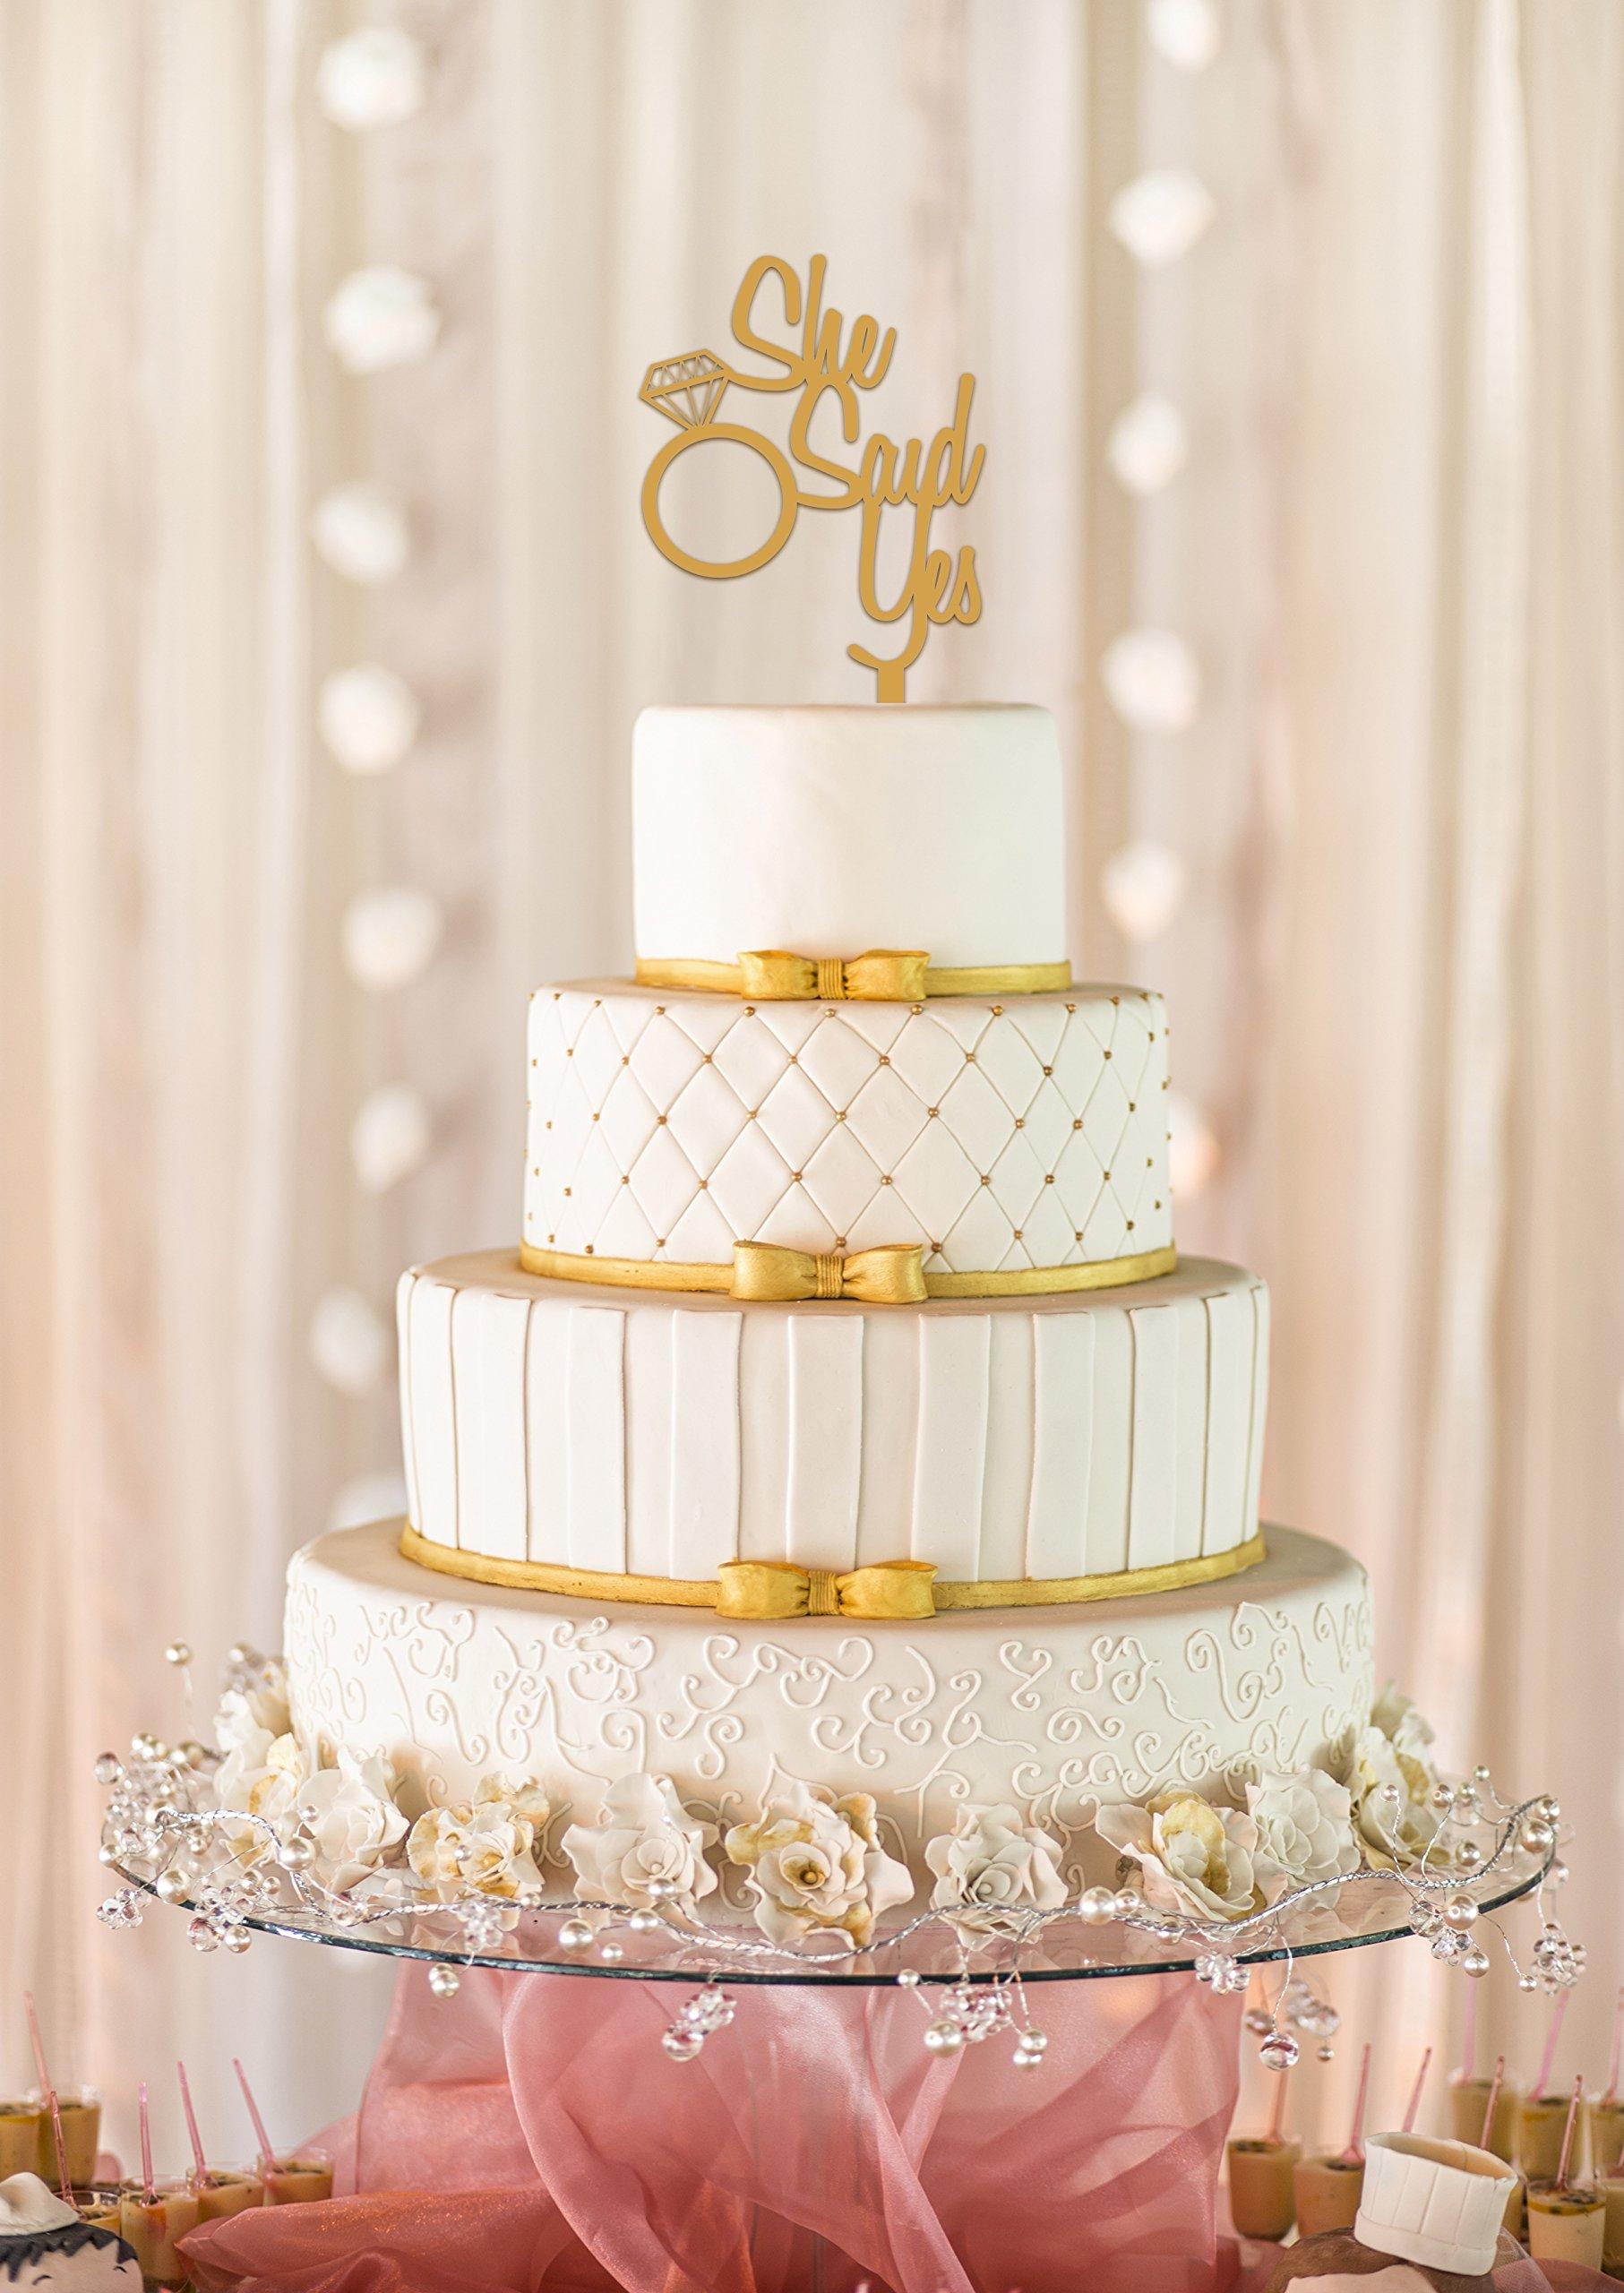 She Said Yes Wedding Cake Topper, Wedding Cake Topper, Bridal Shower Cake Topper, Engagement Party, Bachelorette Party, Wedding Cake Decor (10'', Metallic Gold)